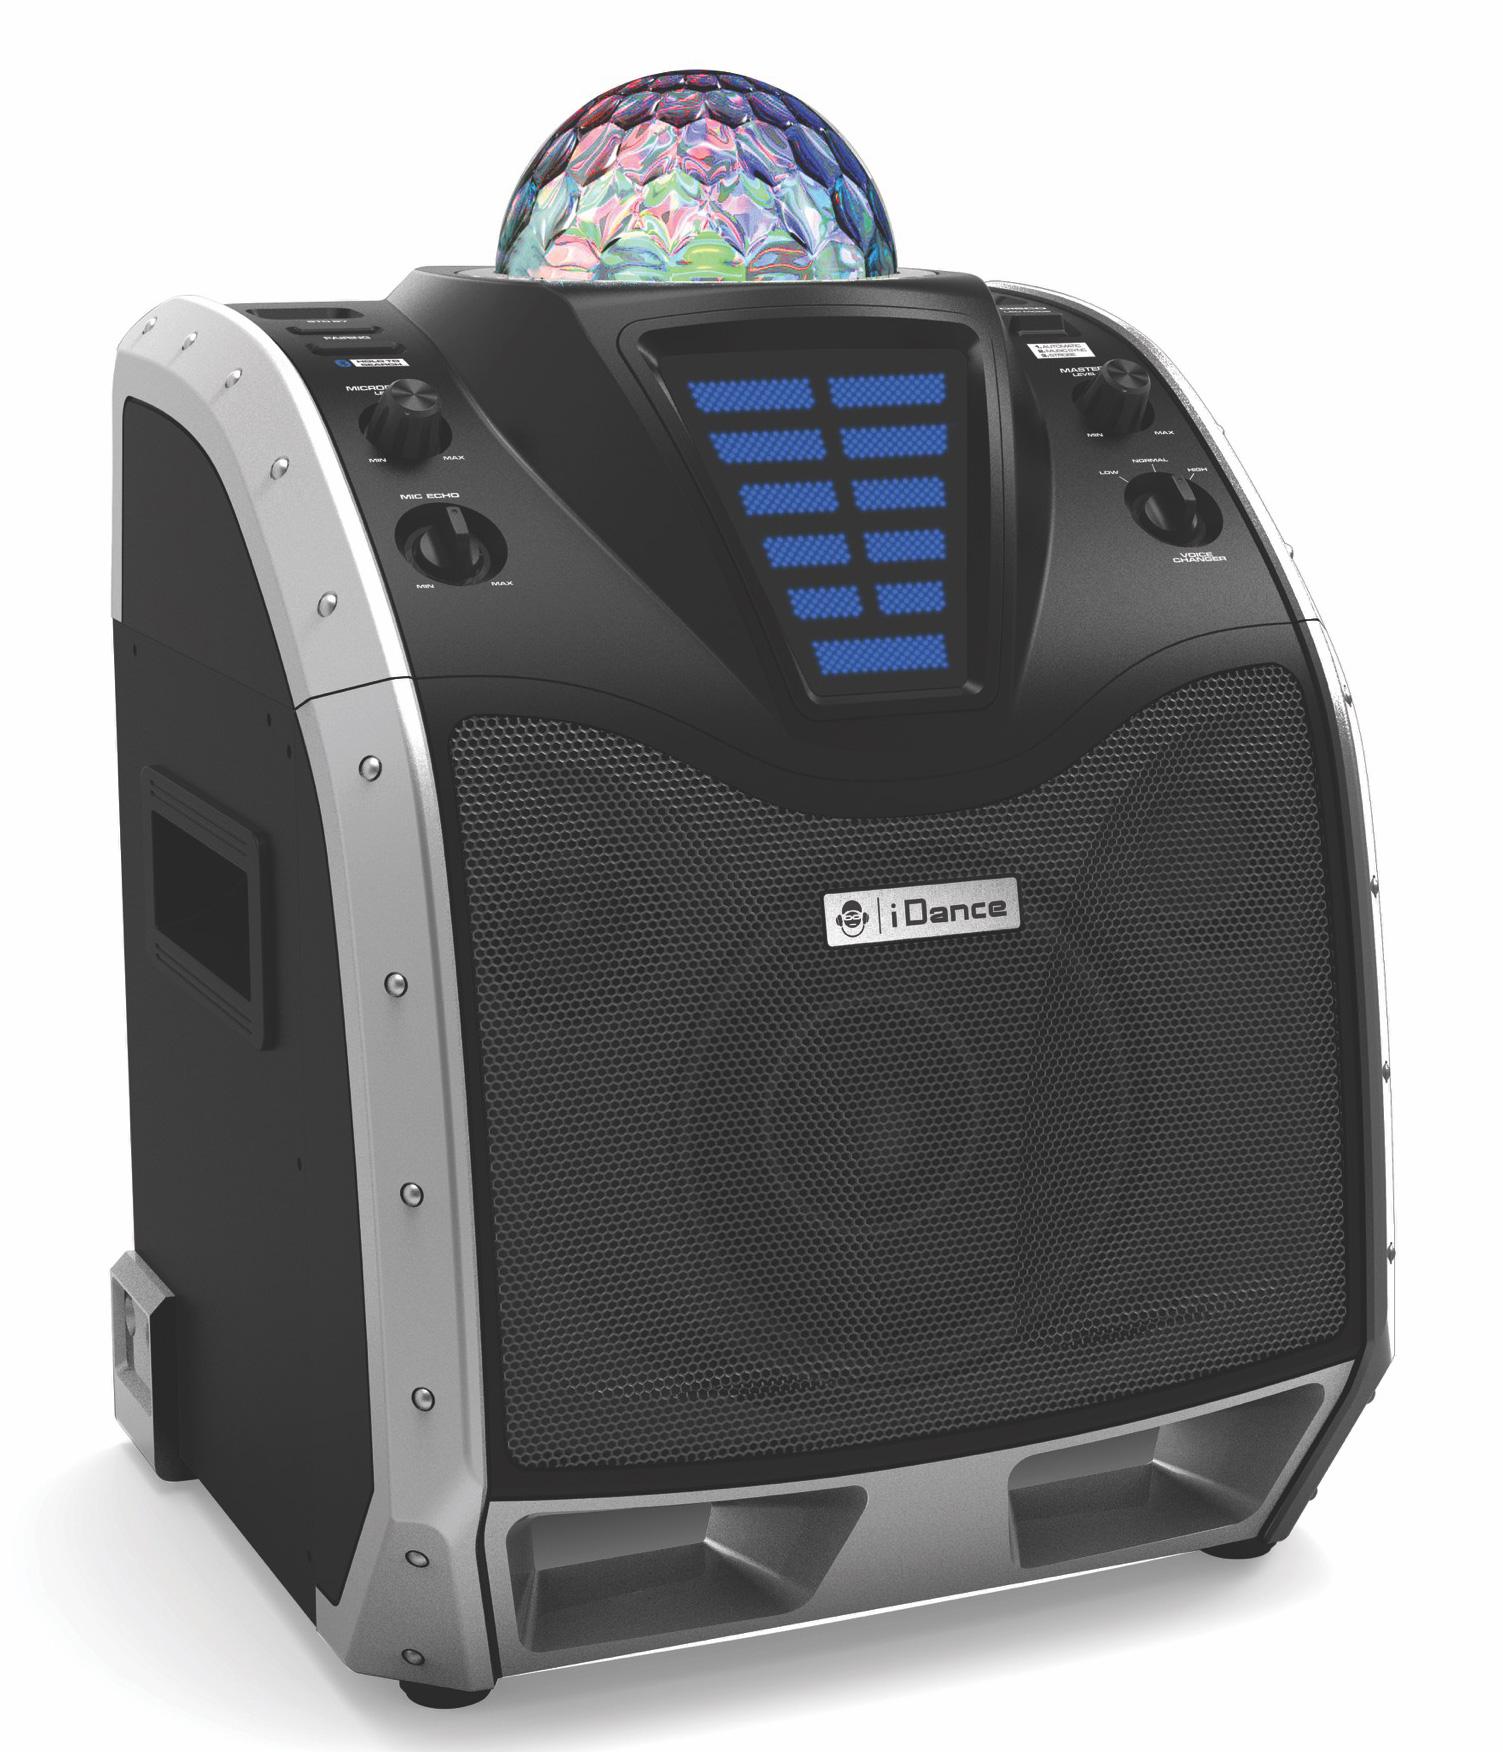 pack de sonorisation portable idance xd200 party station. Black Bedroom Furniture Sets. Home Design Ideas